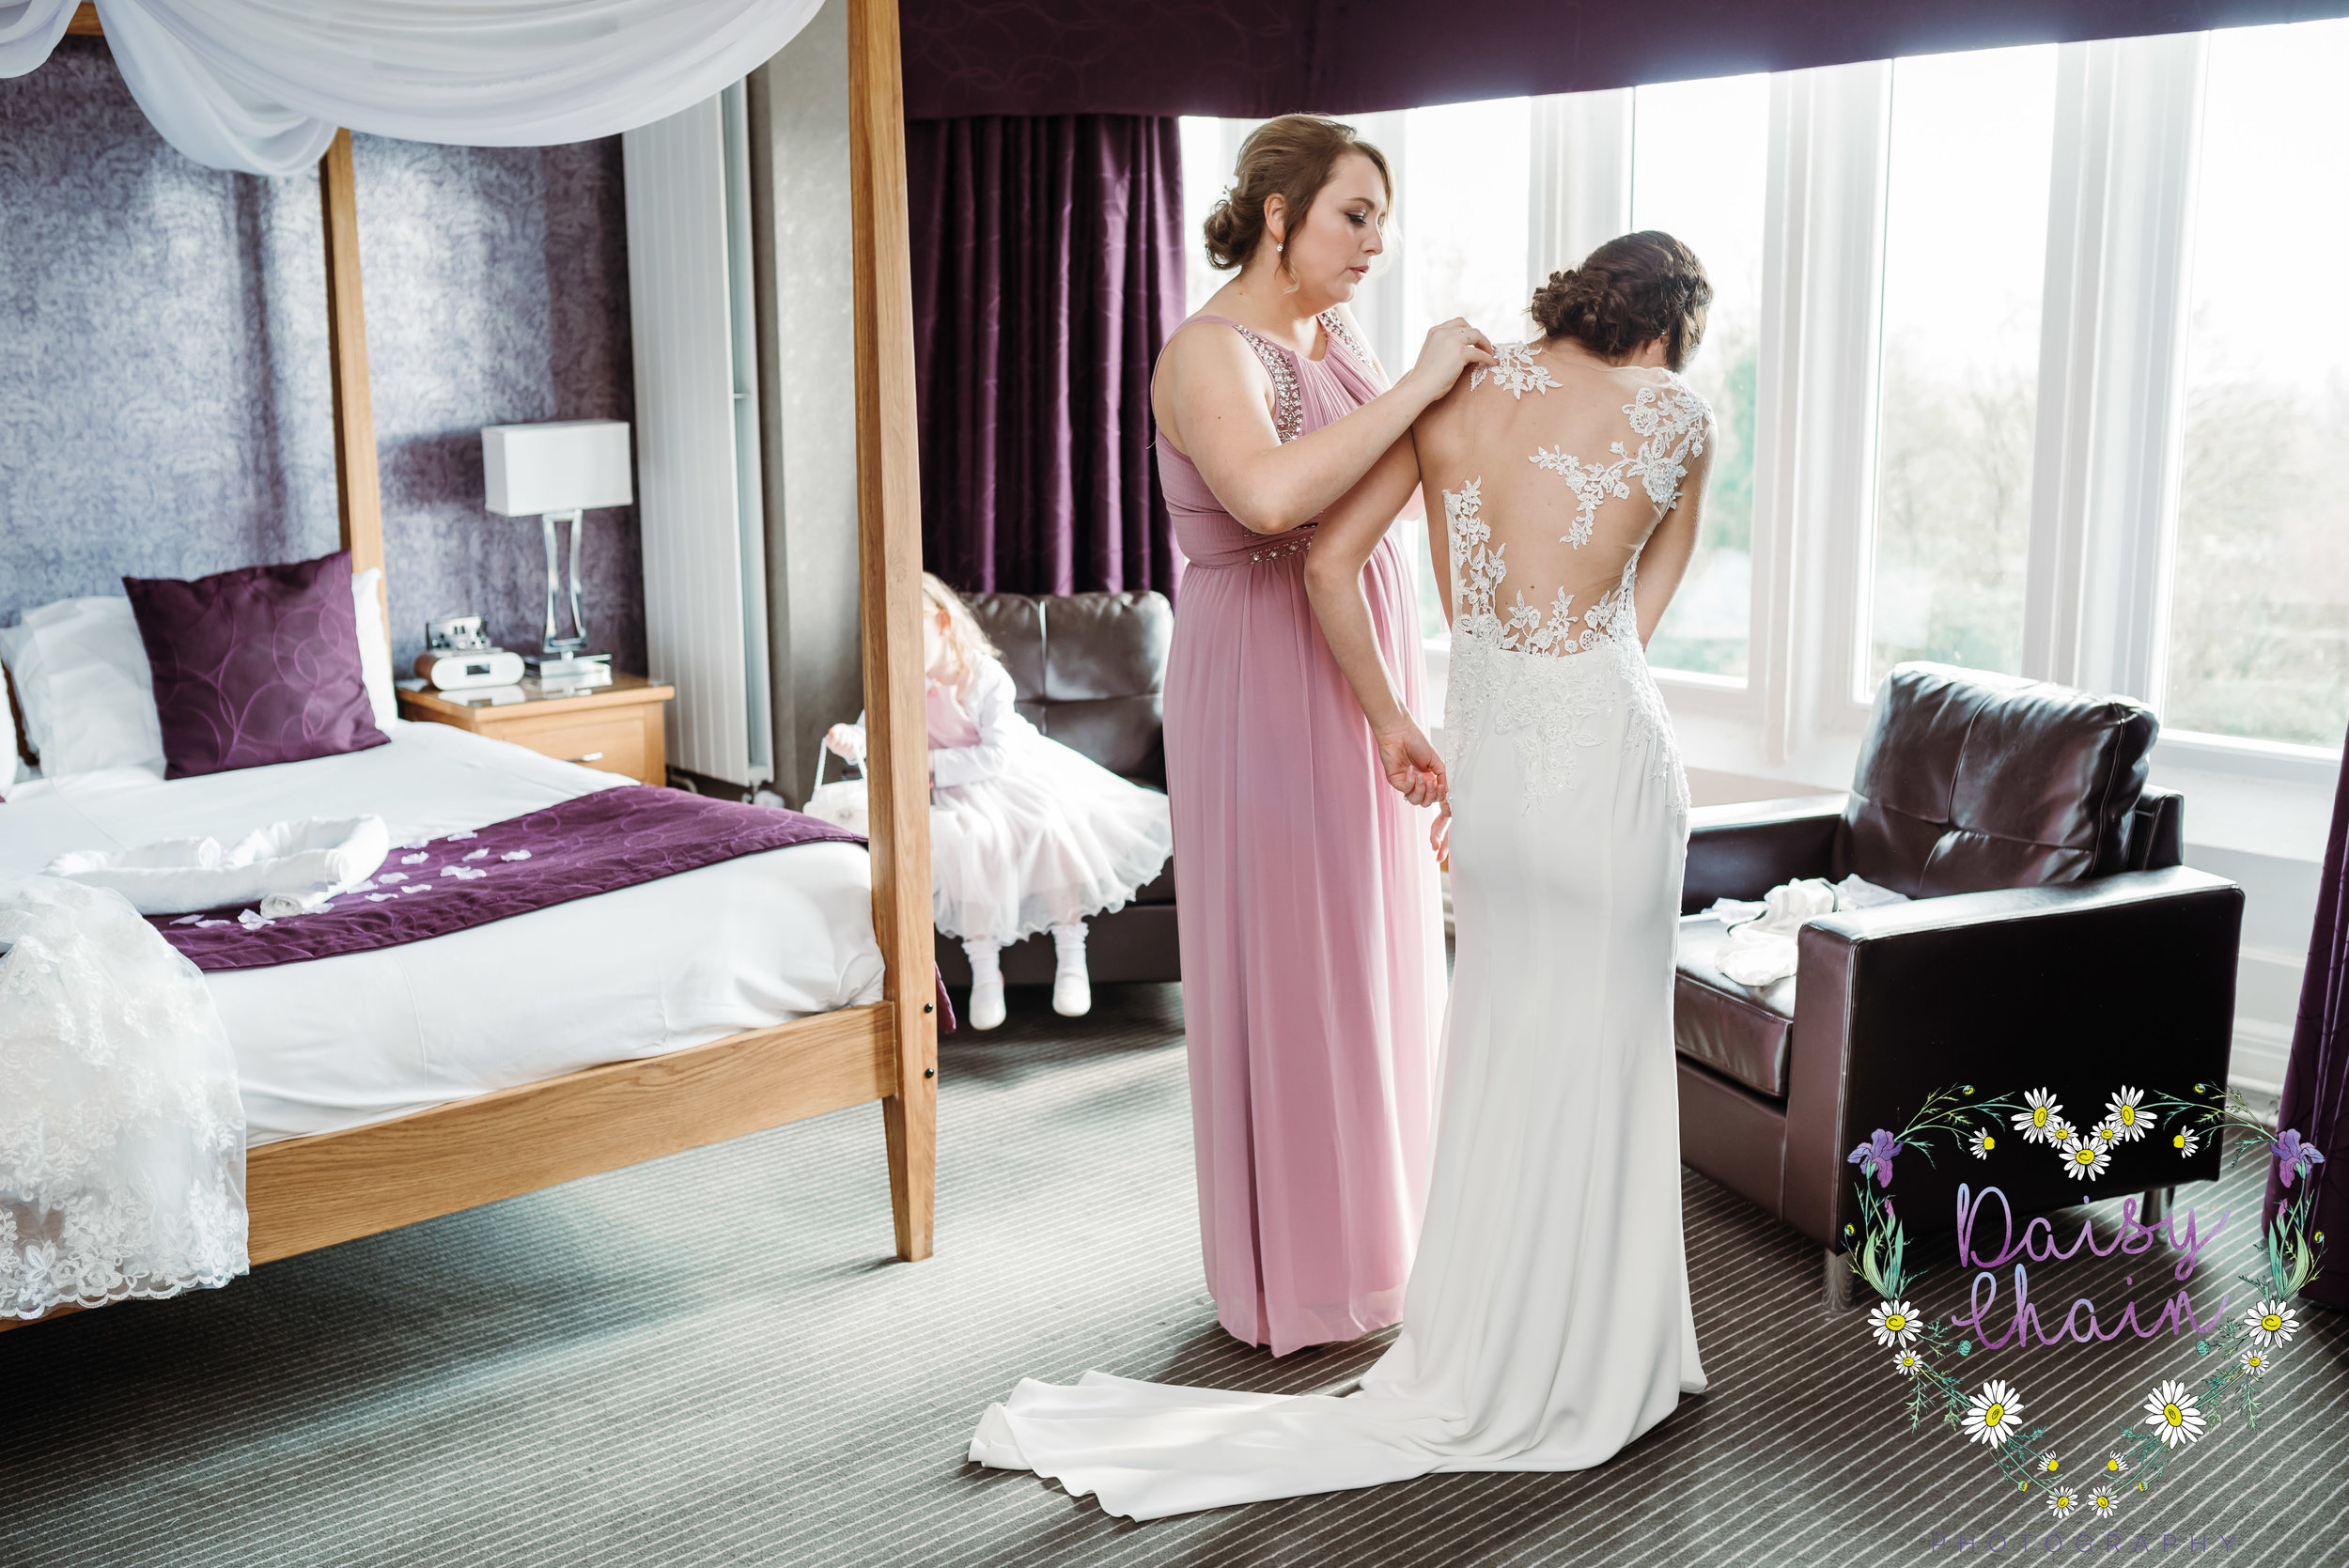 getting the wedding dress on